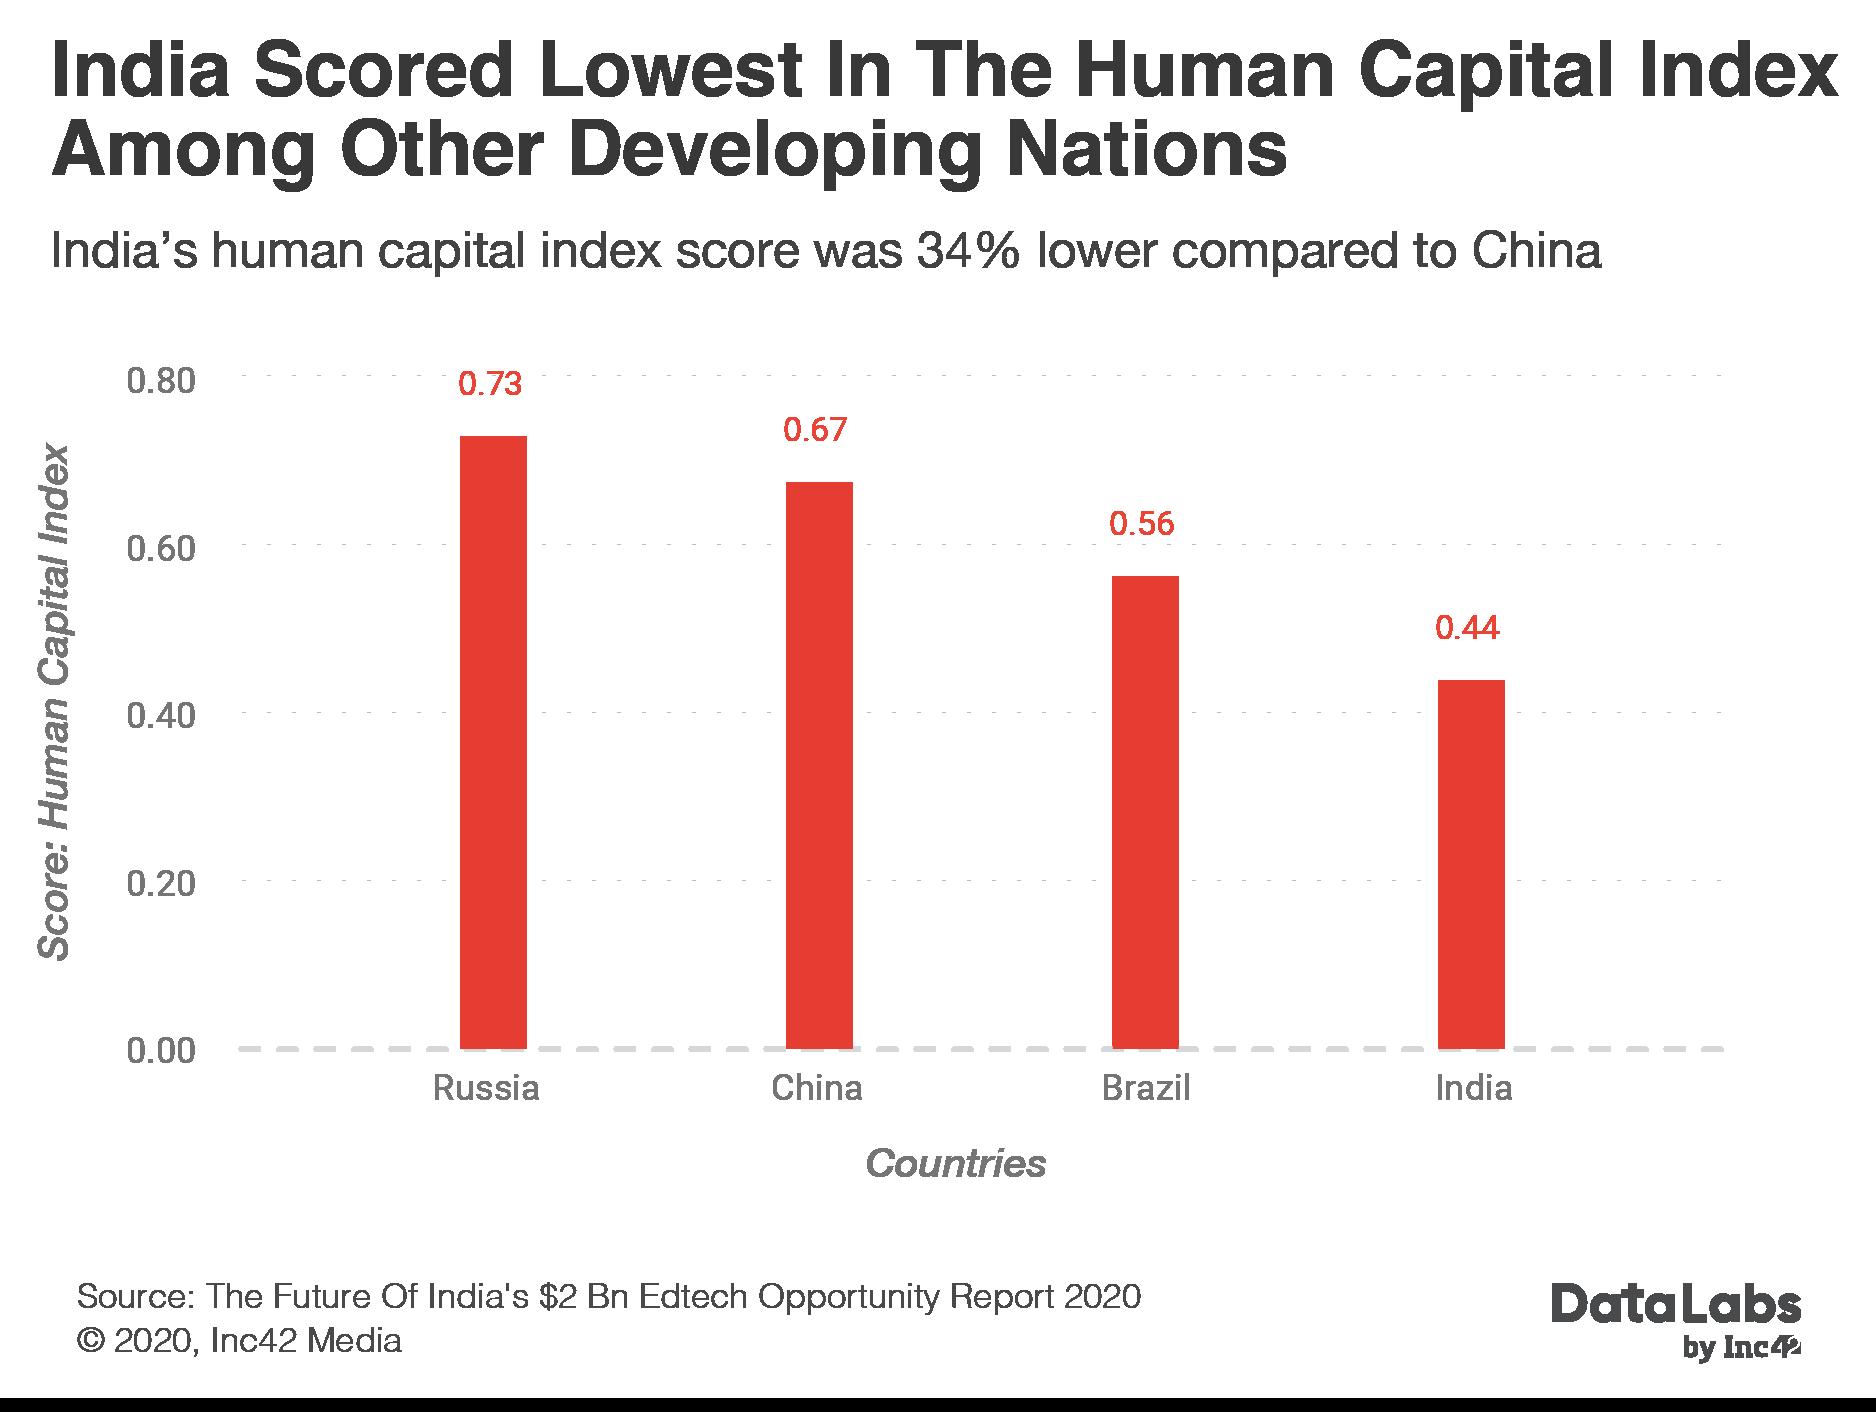 Human Capital Index of India